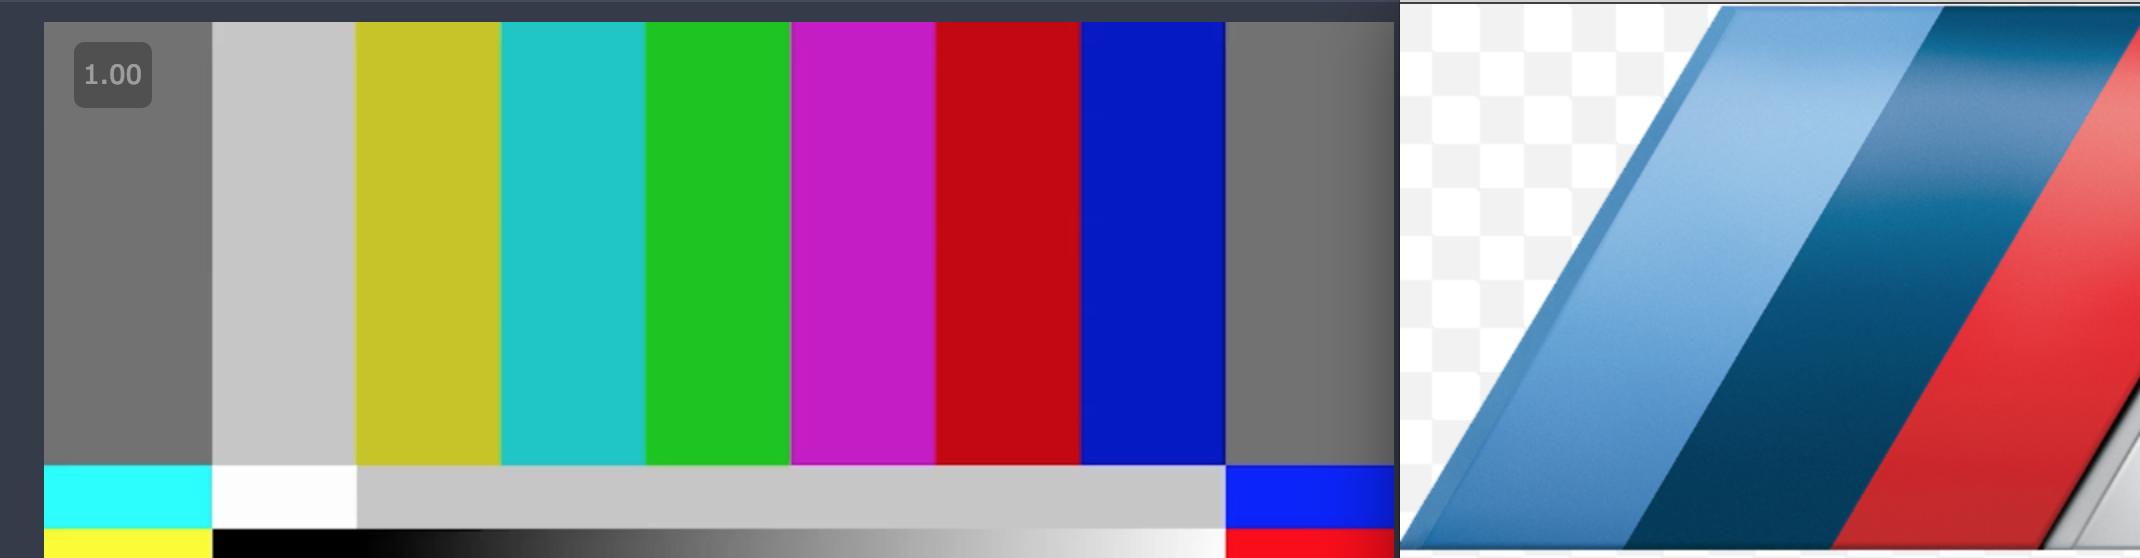 04-colorbar-bmw2.png